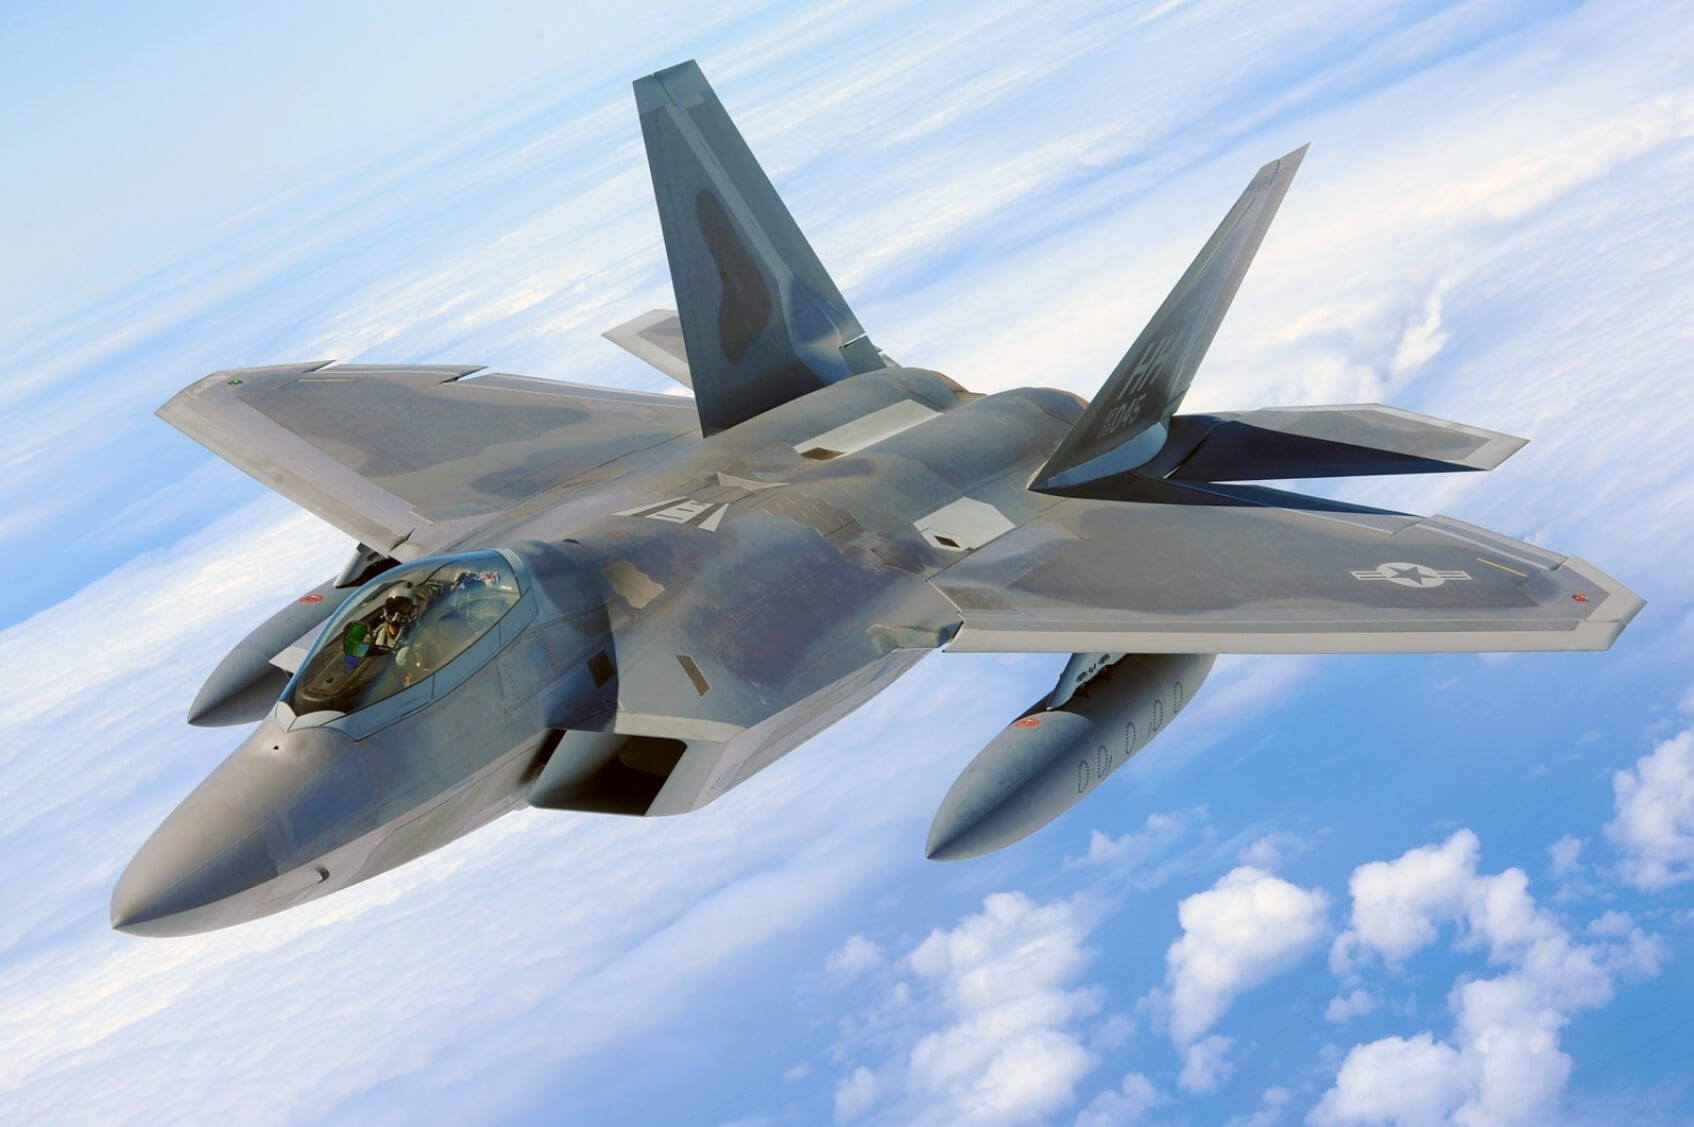 Military Jet Fighter - Original image